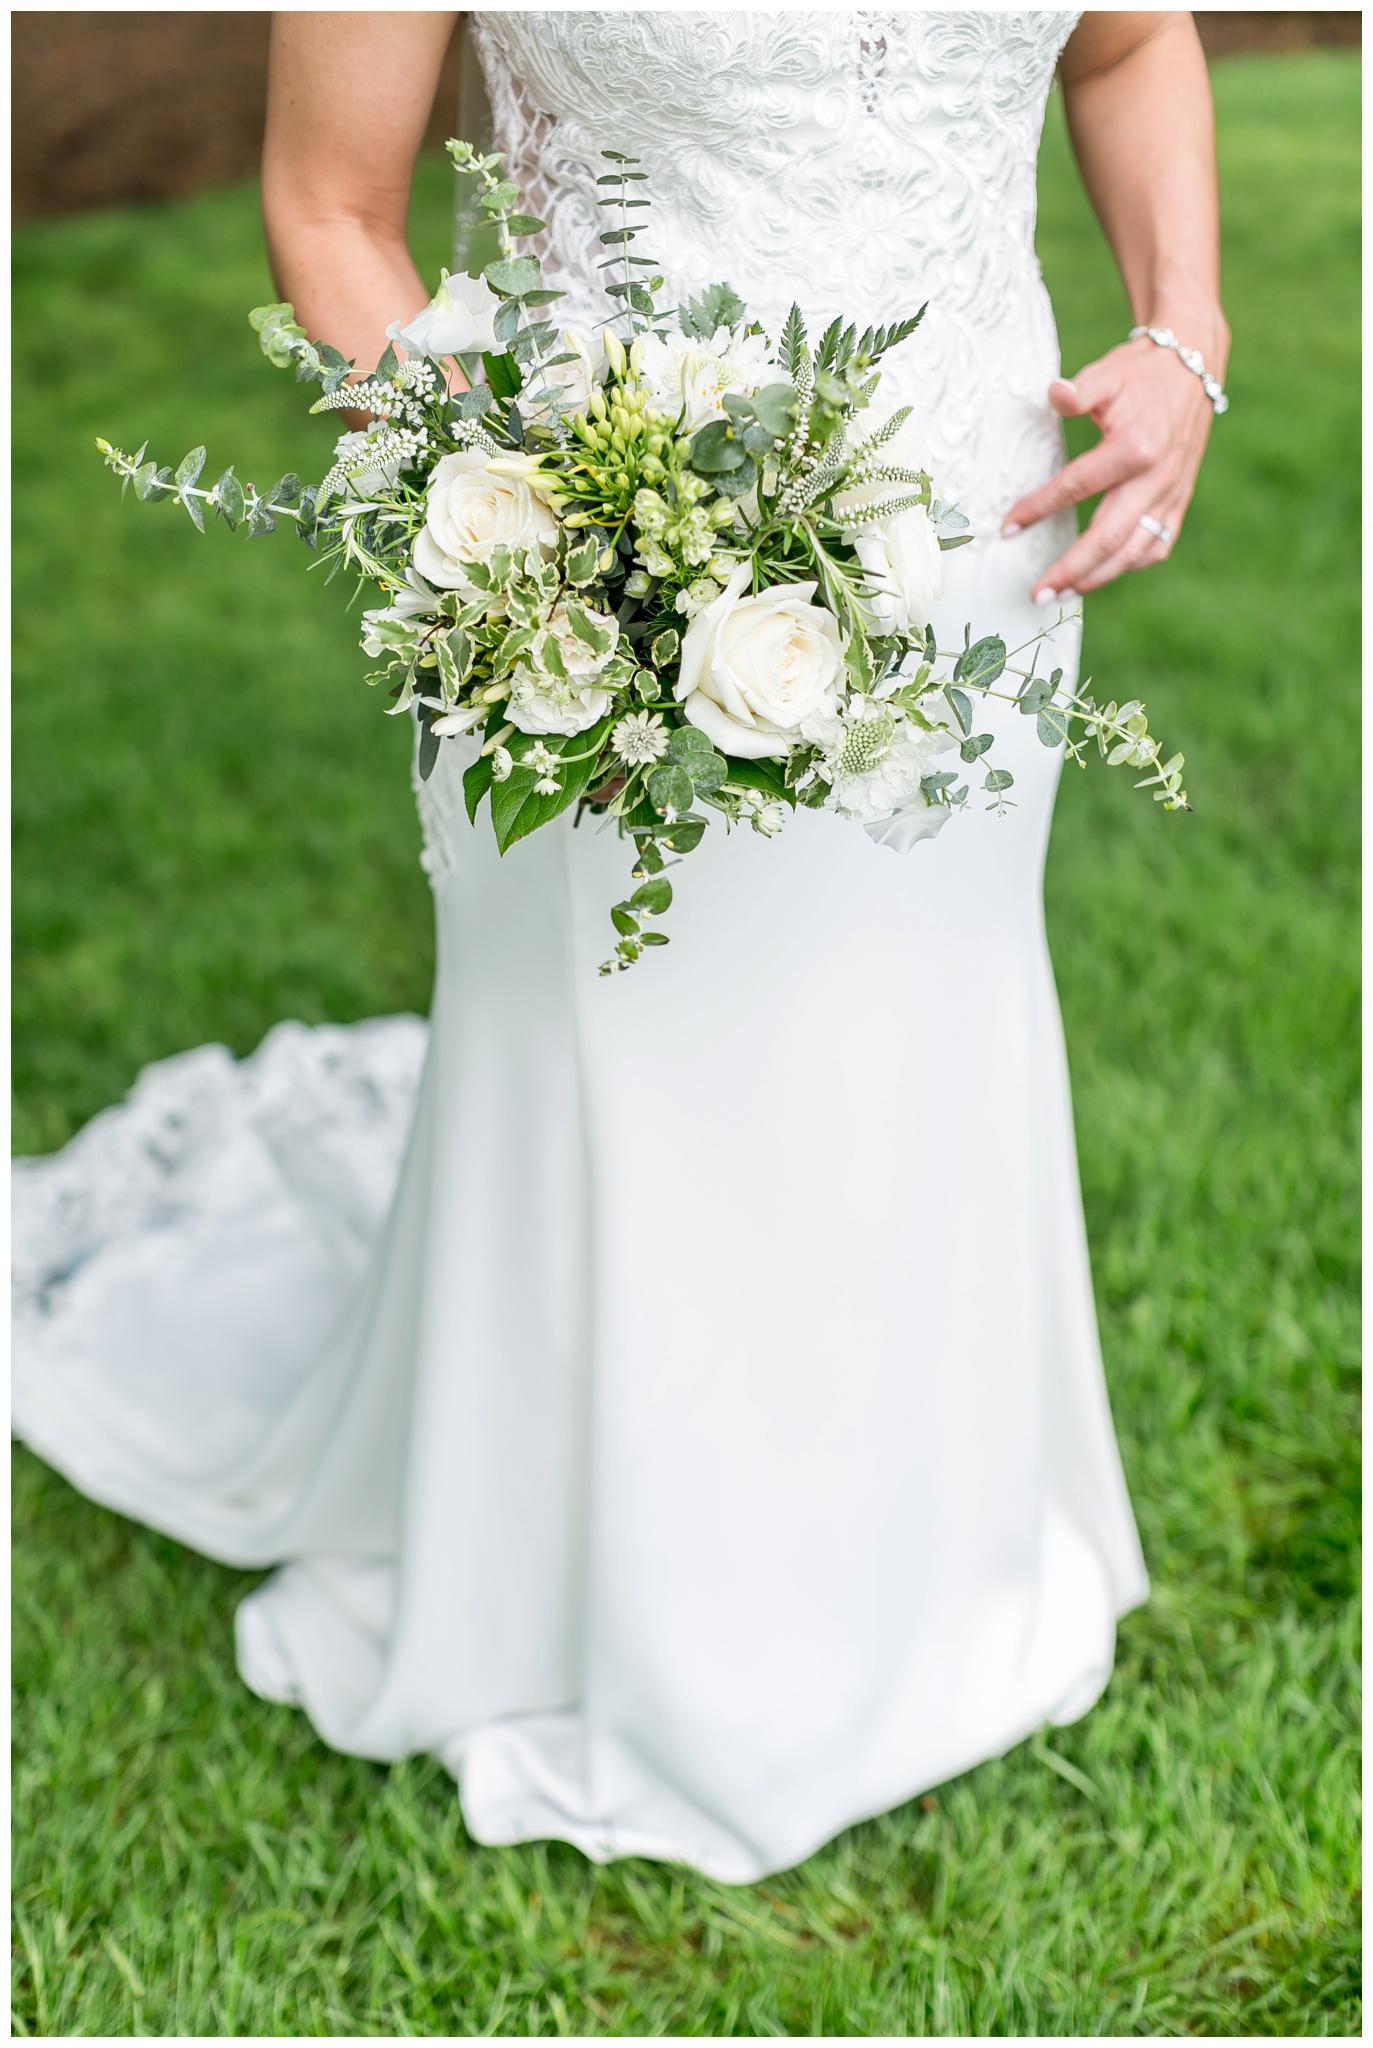 Union_south_Wedding_Madison_Wisconsin_Caynay_Photo_3656.jpg